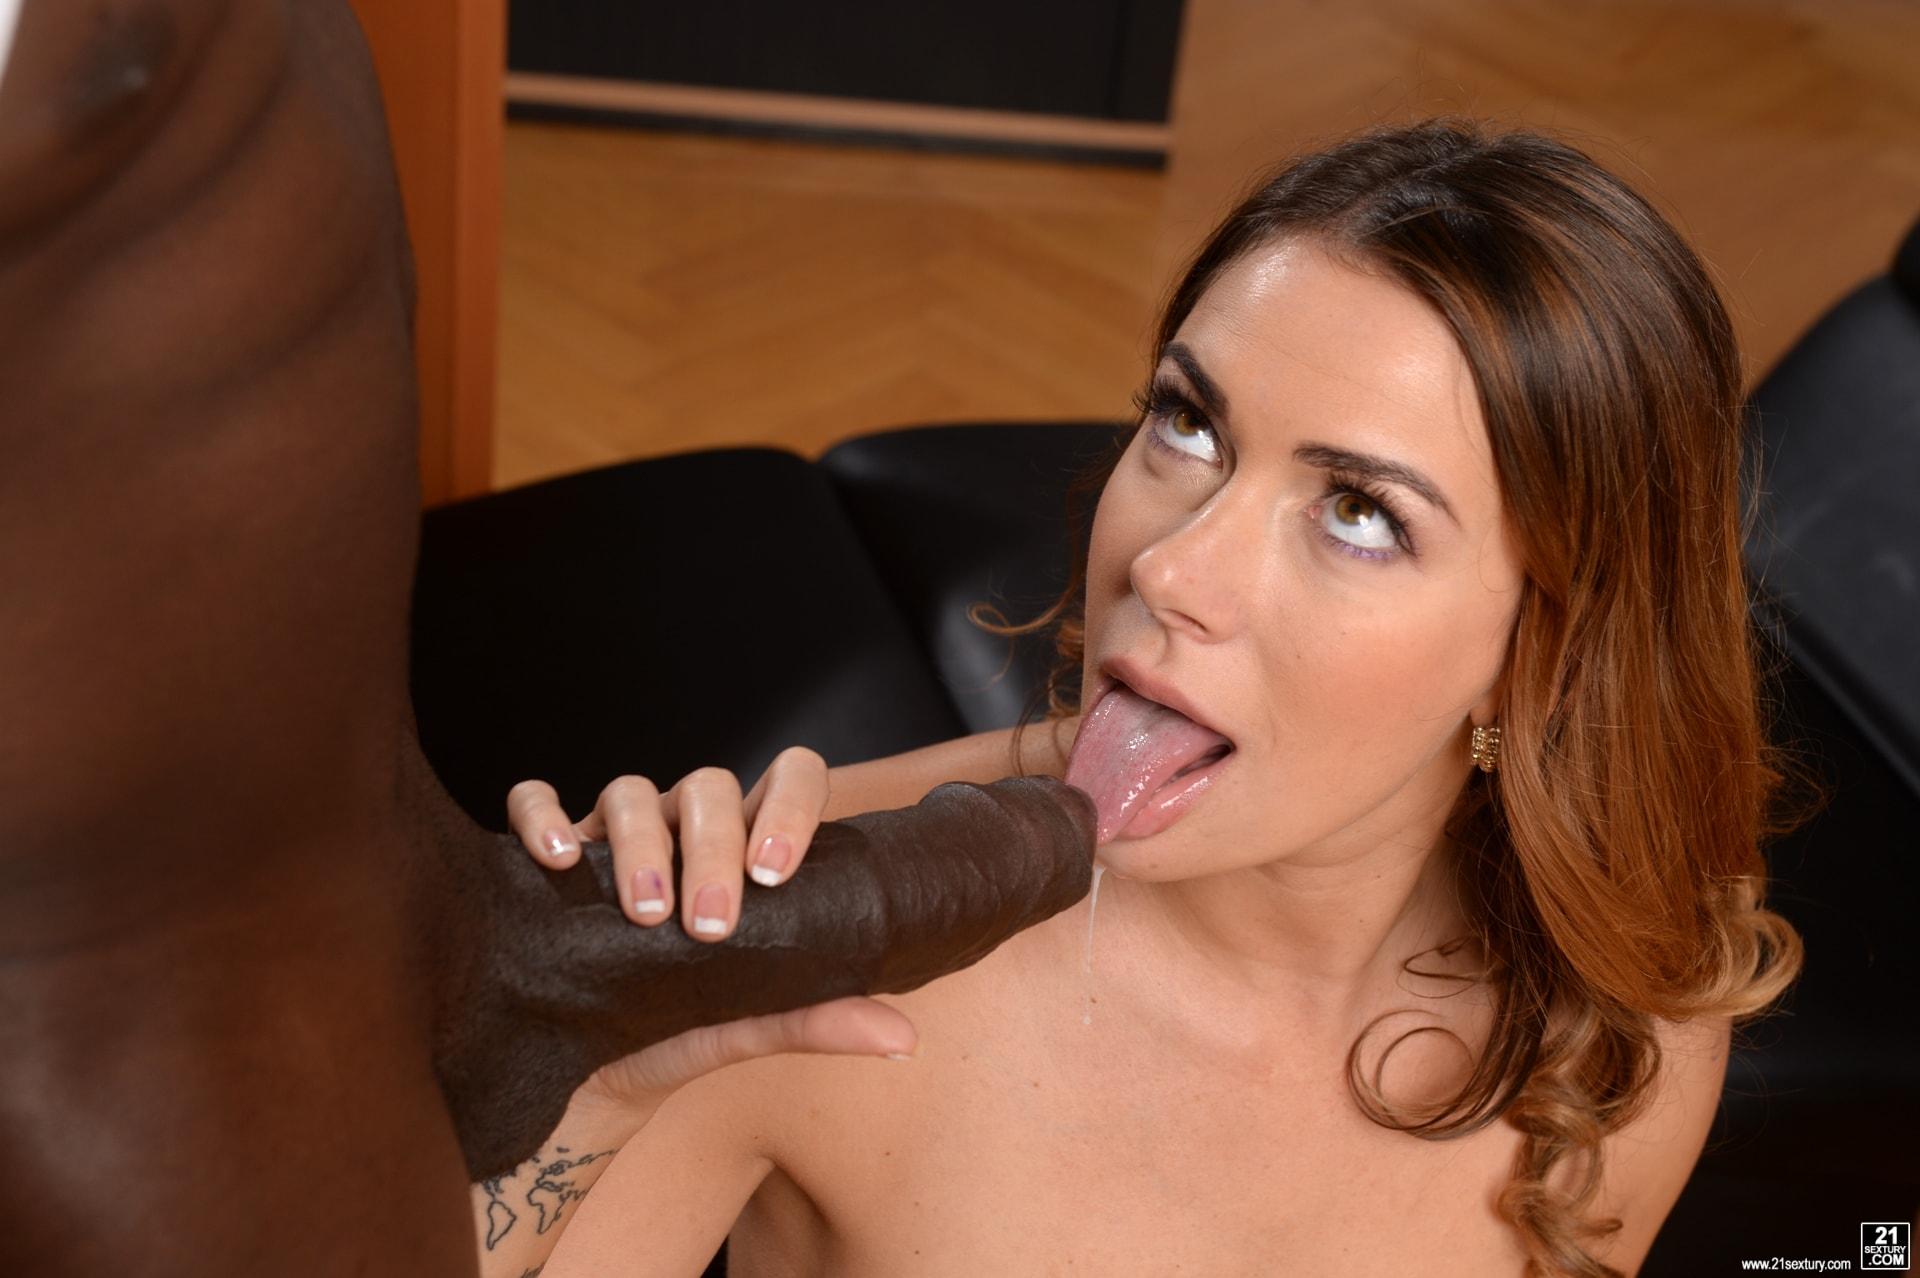 21Sextury 'My Bosses DP'd Me At Work' starring Ani Black Fox (Photo 225)